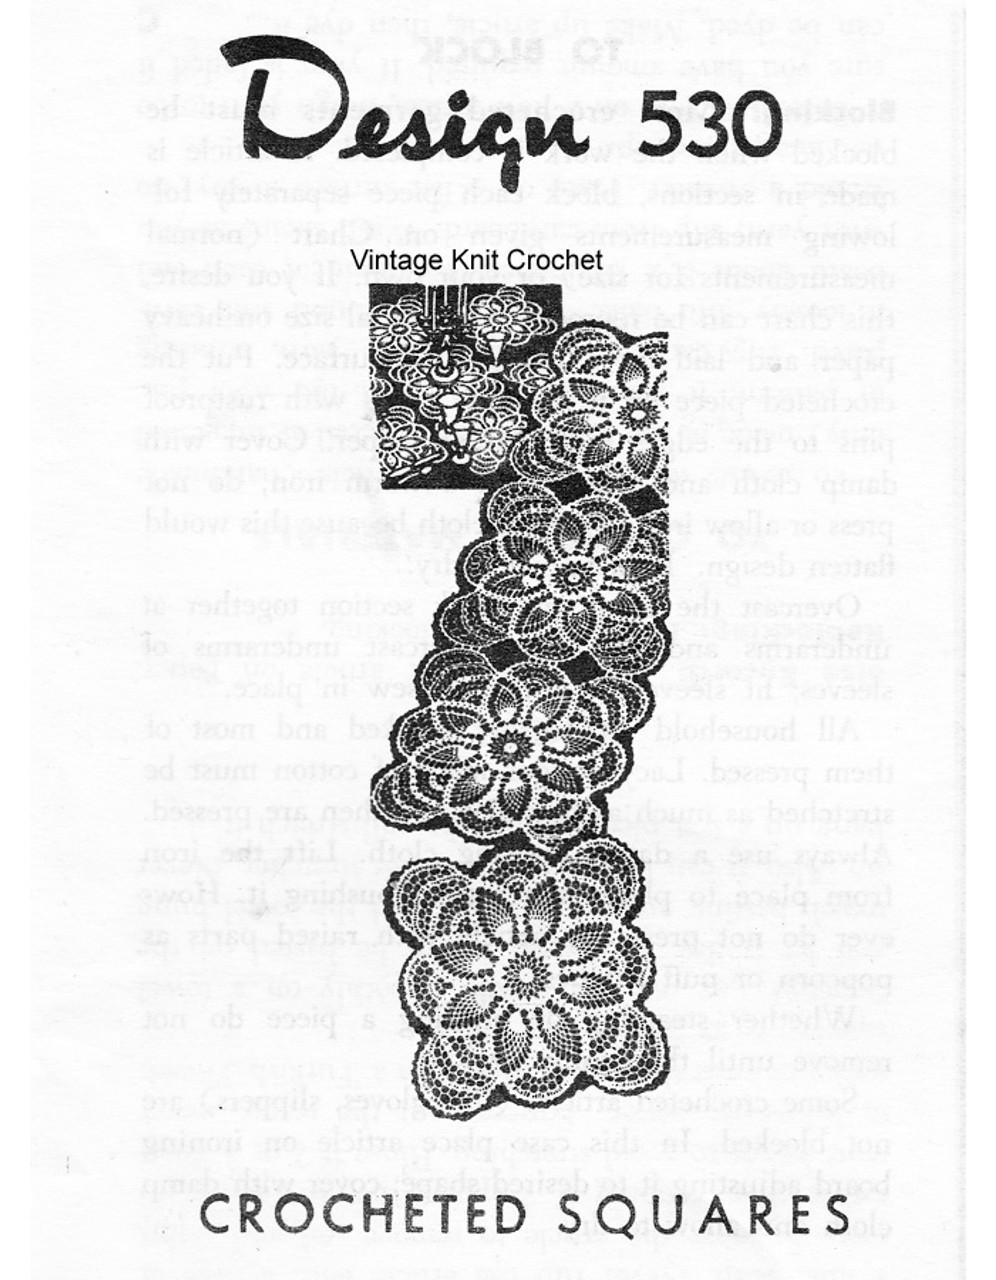 Square Pineapple Crochet Doily Pattern, Mail Order 530